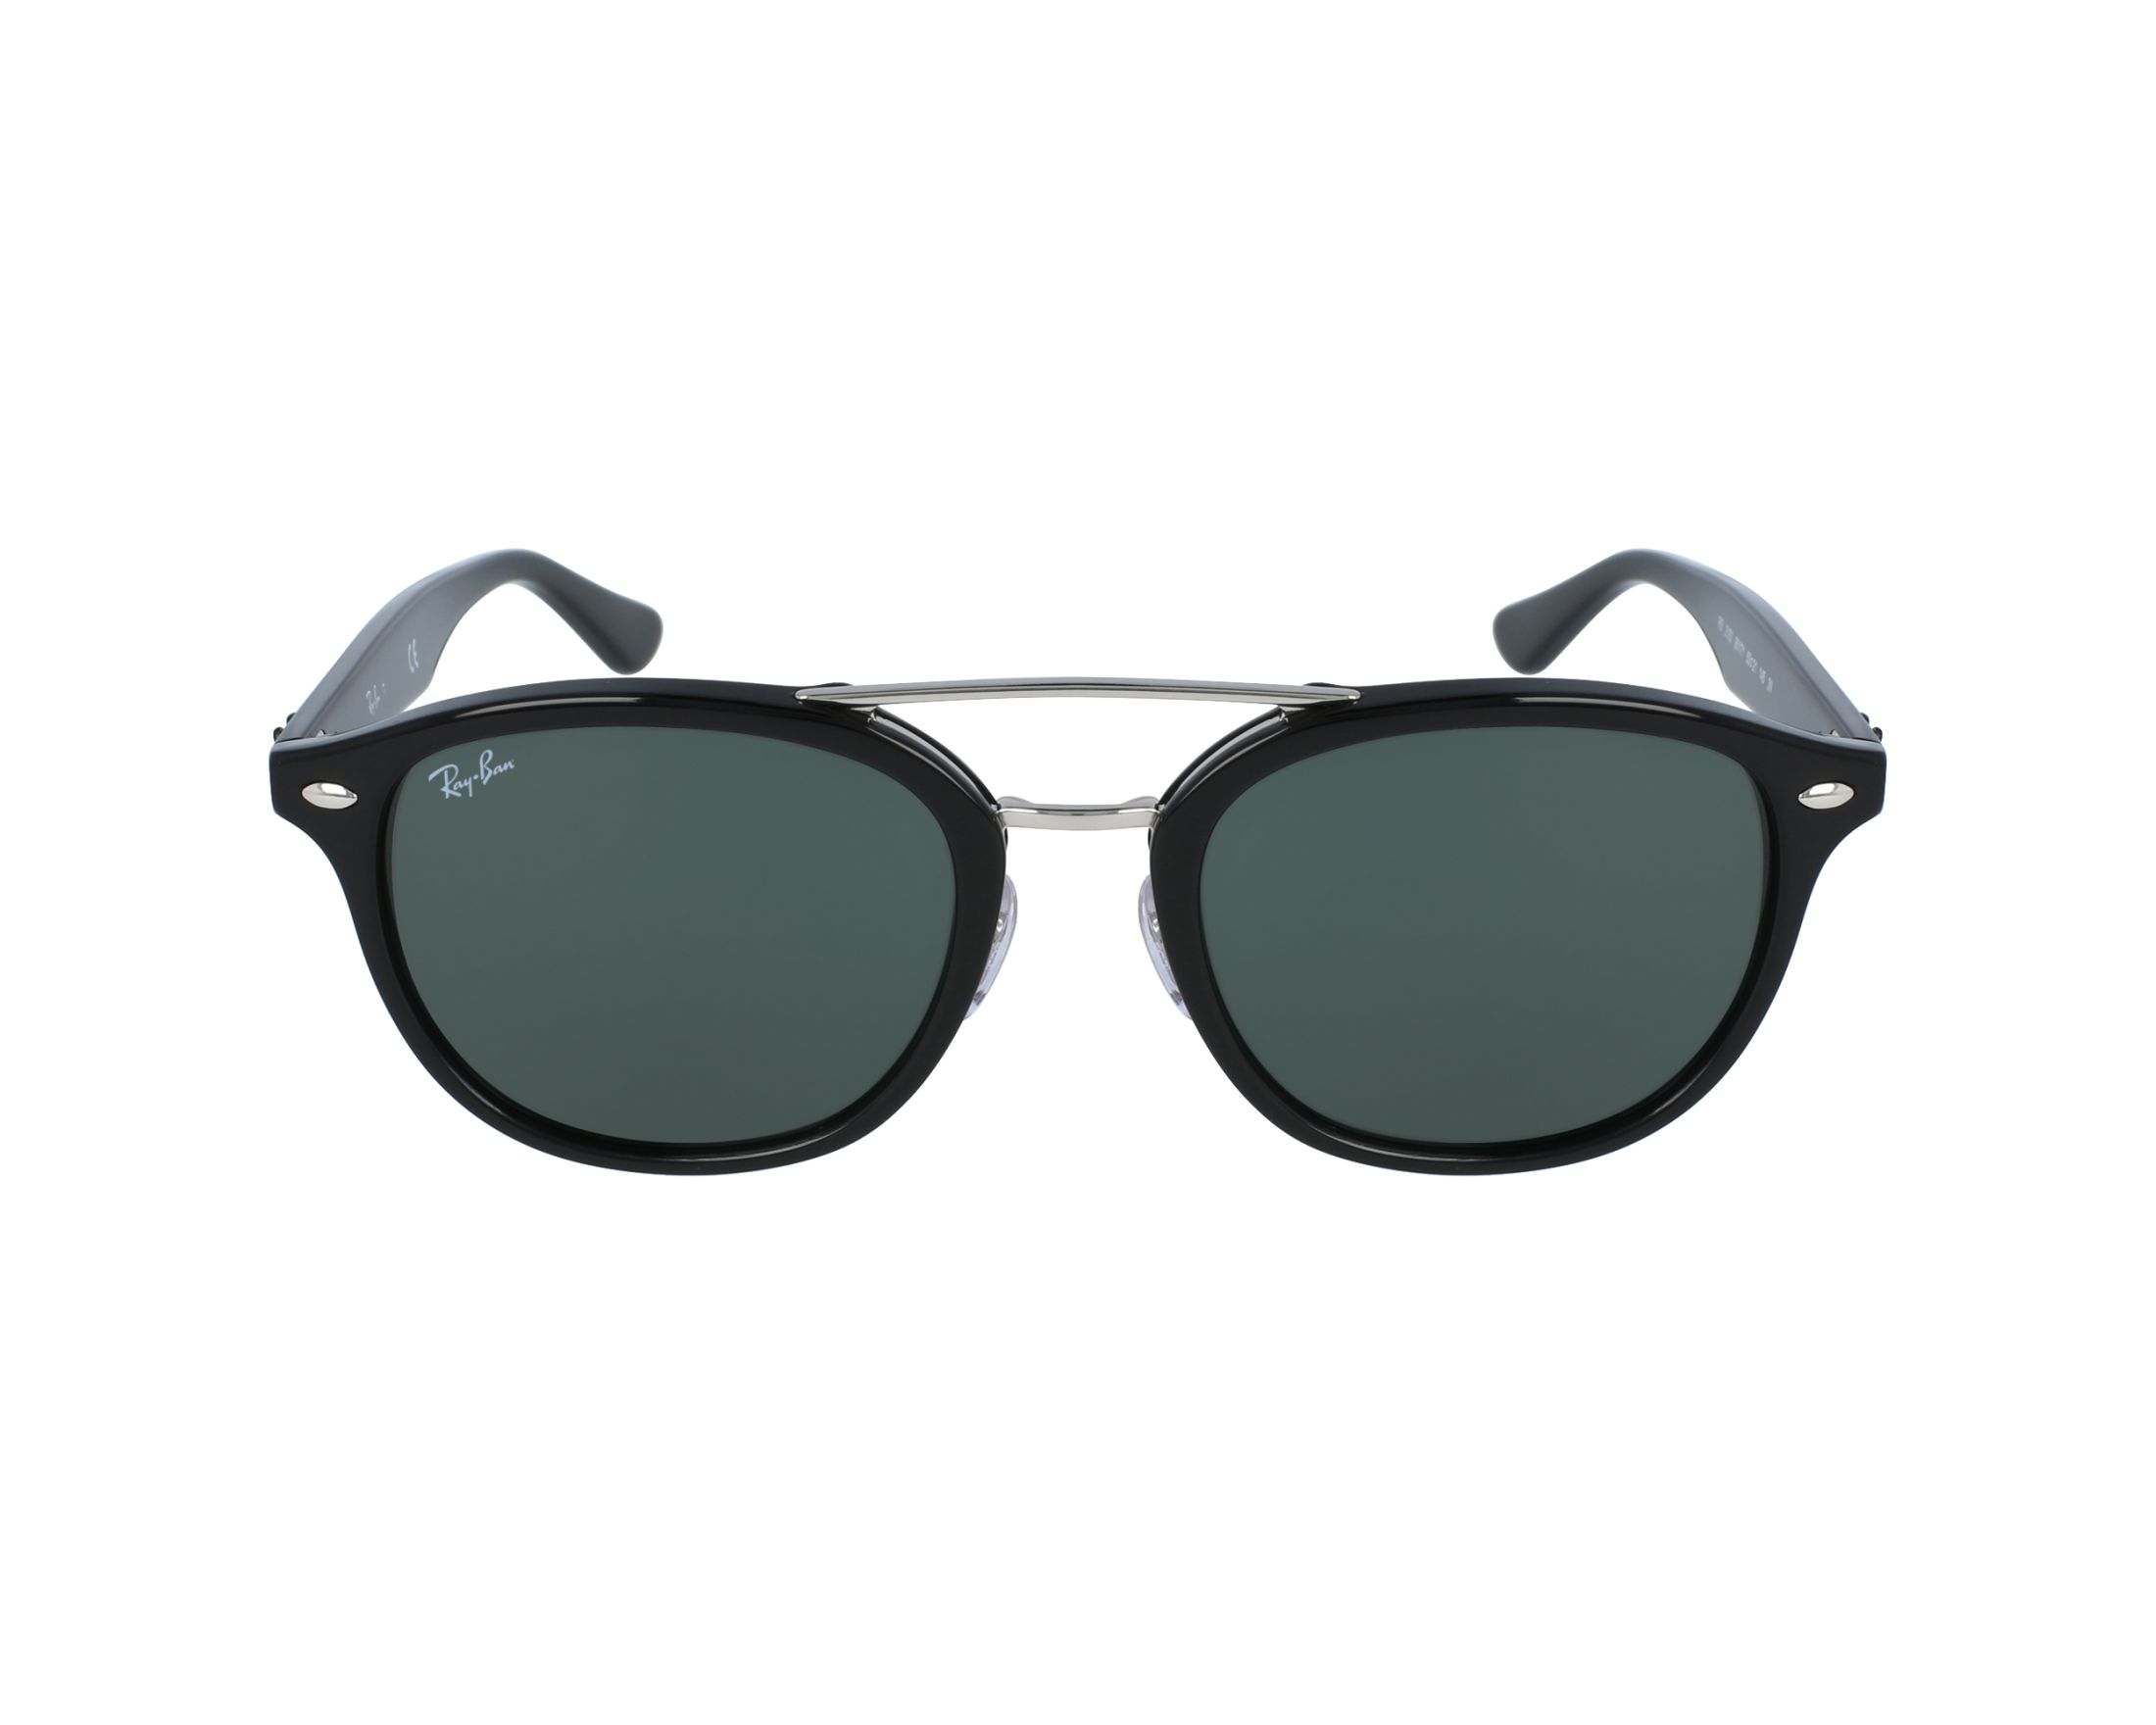 7989b15422 Sunglasses Ray-Ban RB-2183 901 71 53-21 Black profile view